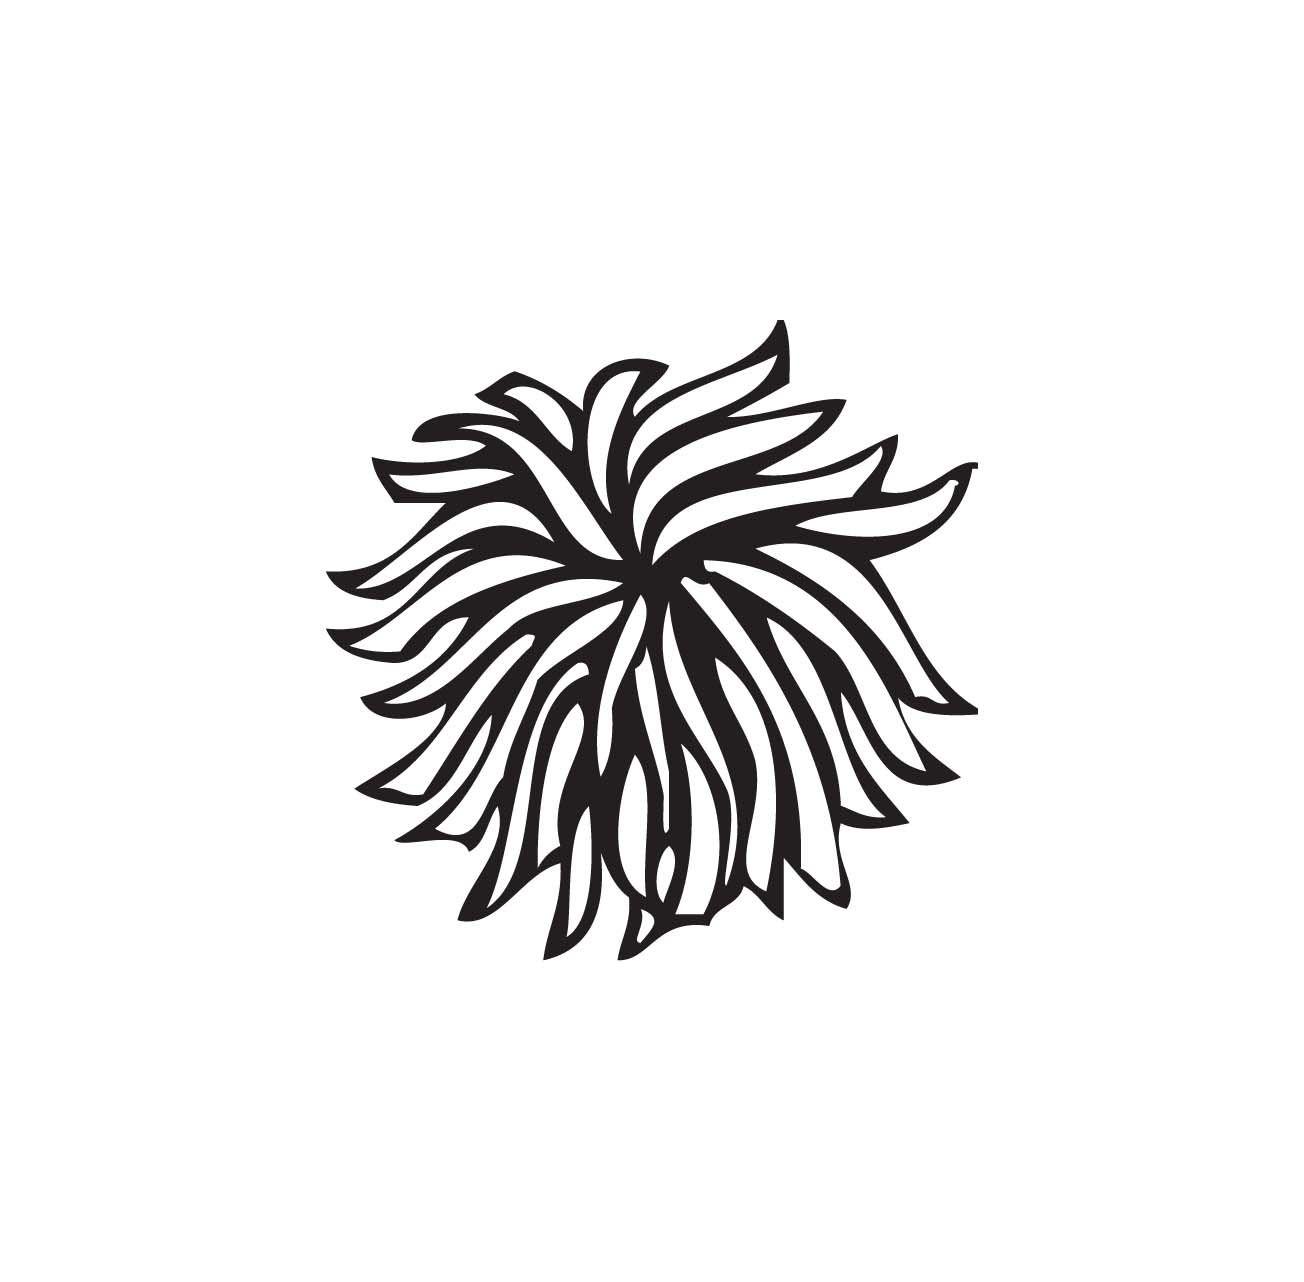 Pom Poms Clipart Clipart Best Clip Art Pom Pom Black And White Instagram